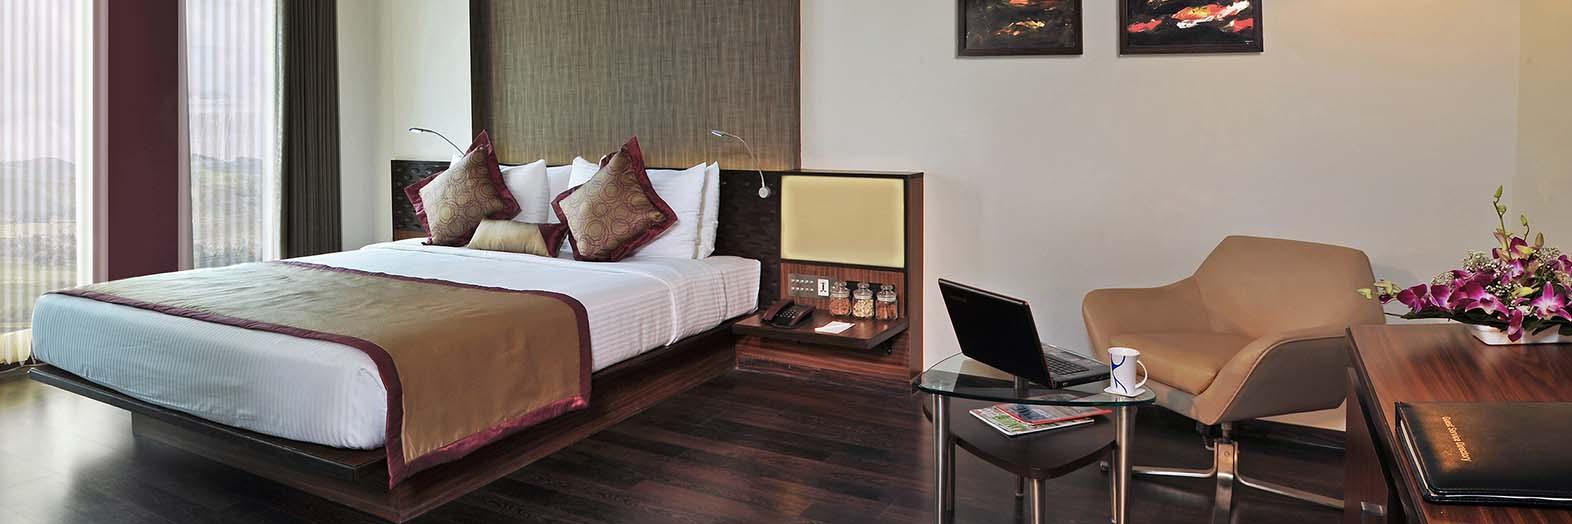 Fortune Inn Exotica, Hinjawadi–Hotels in Pune Room